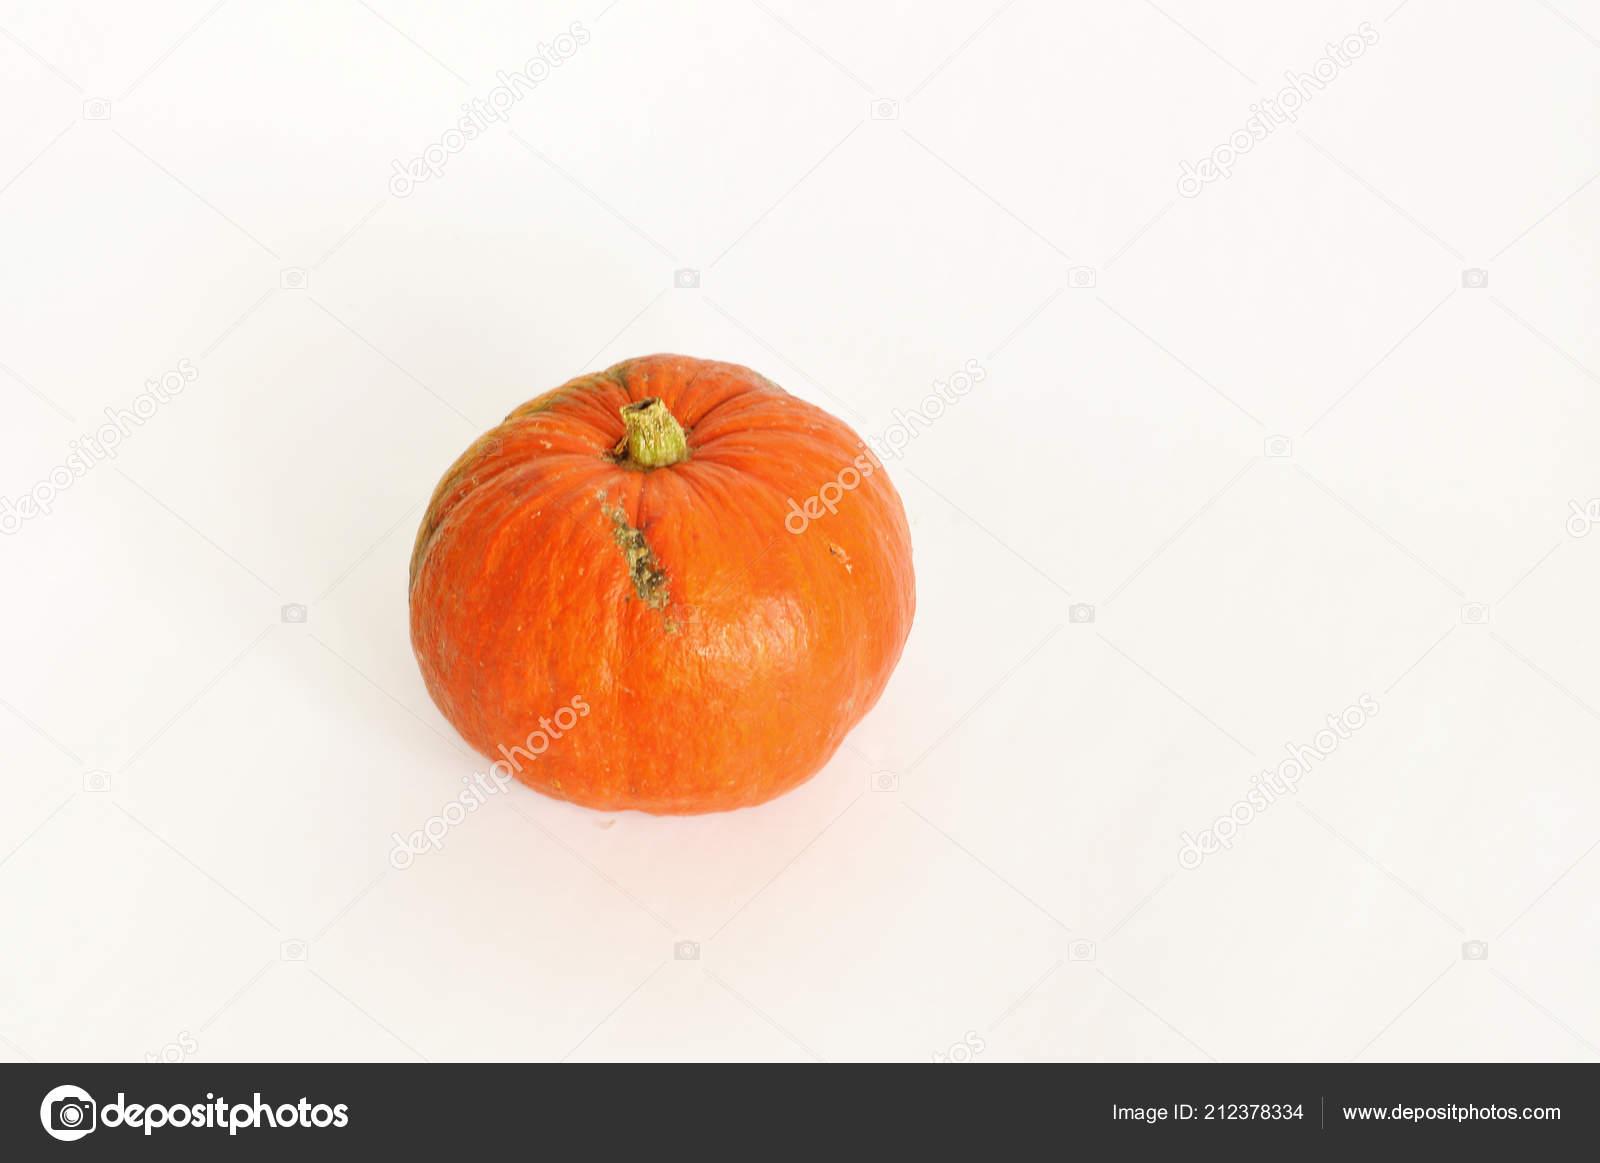 Isolated Photo Pumpkin Orange Pumpkin White Background Use